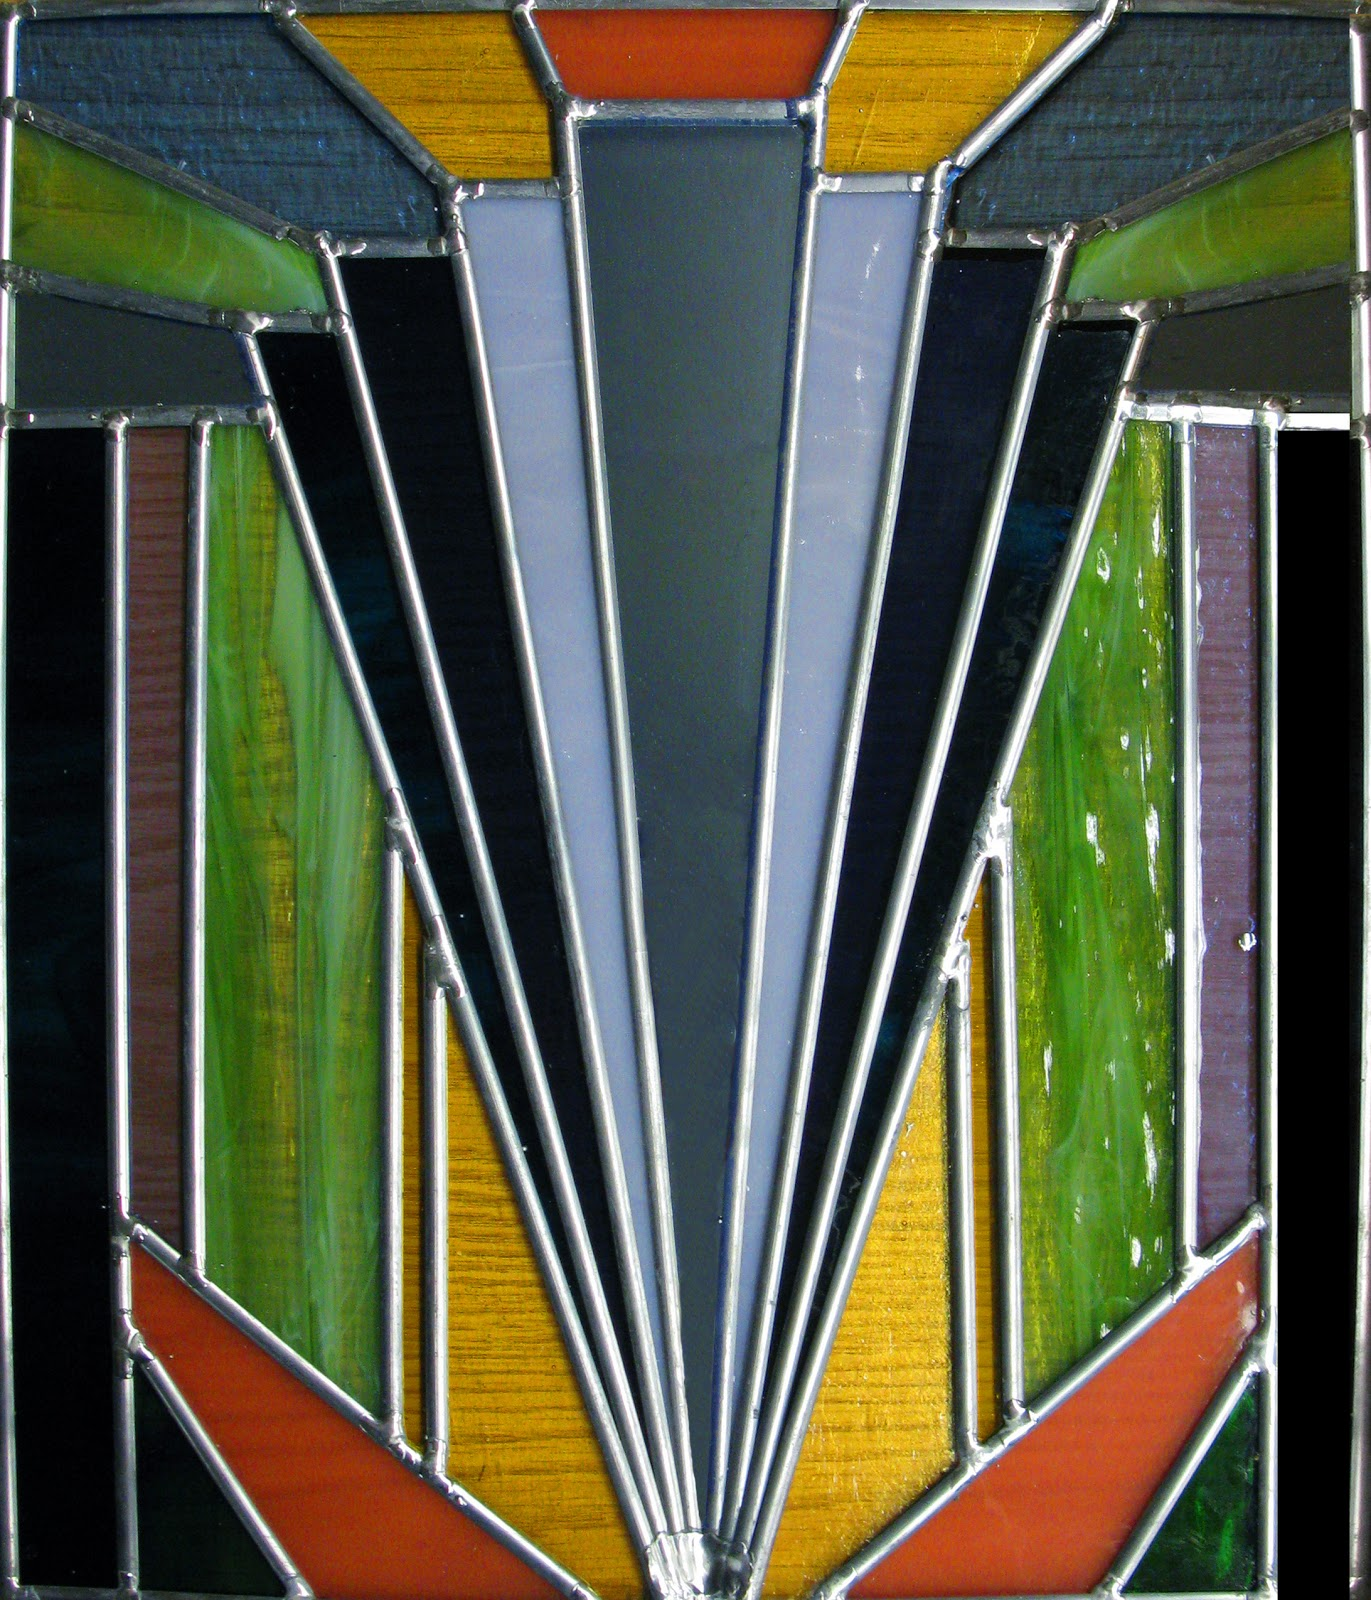 1000 images about project art deco on pinterest art for Art deco glass windows